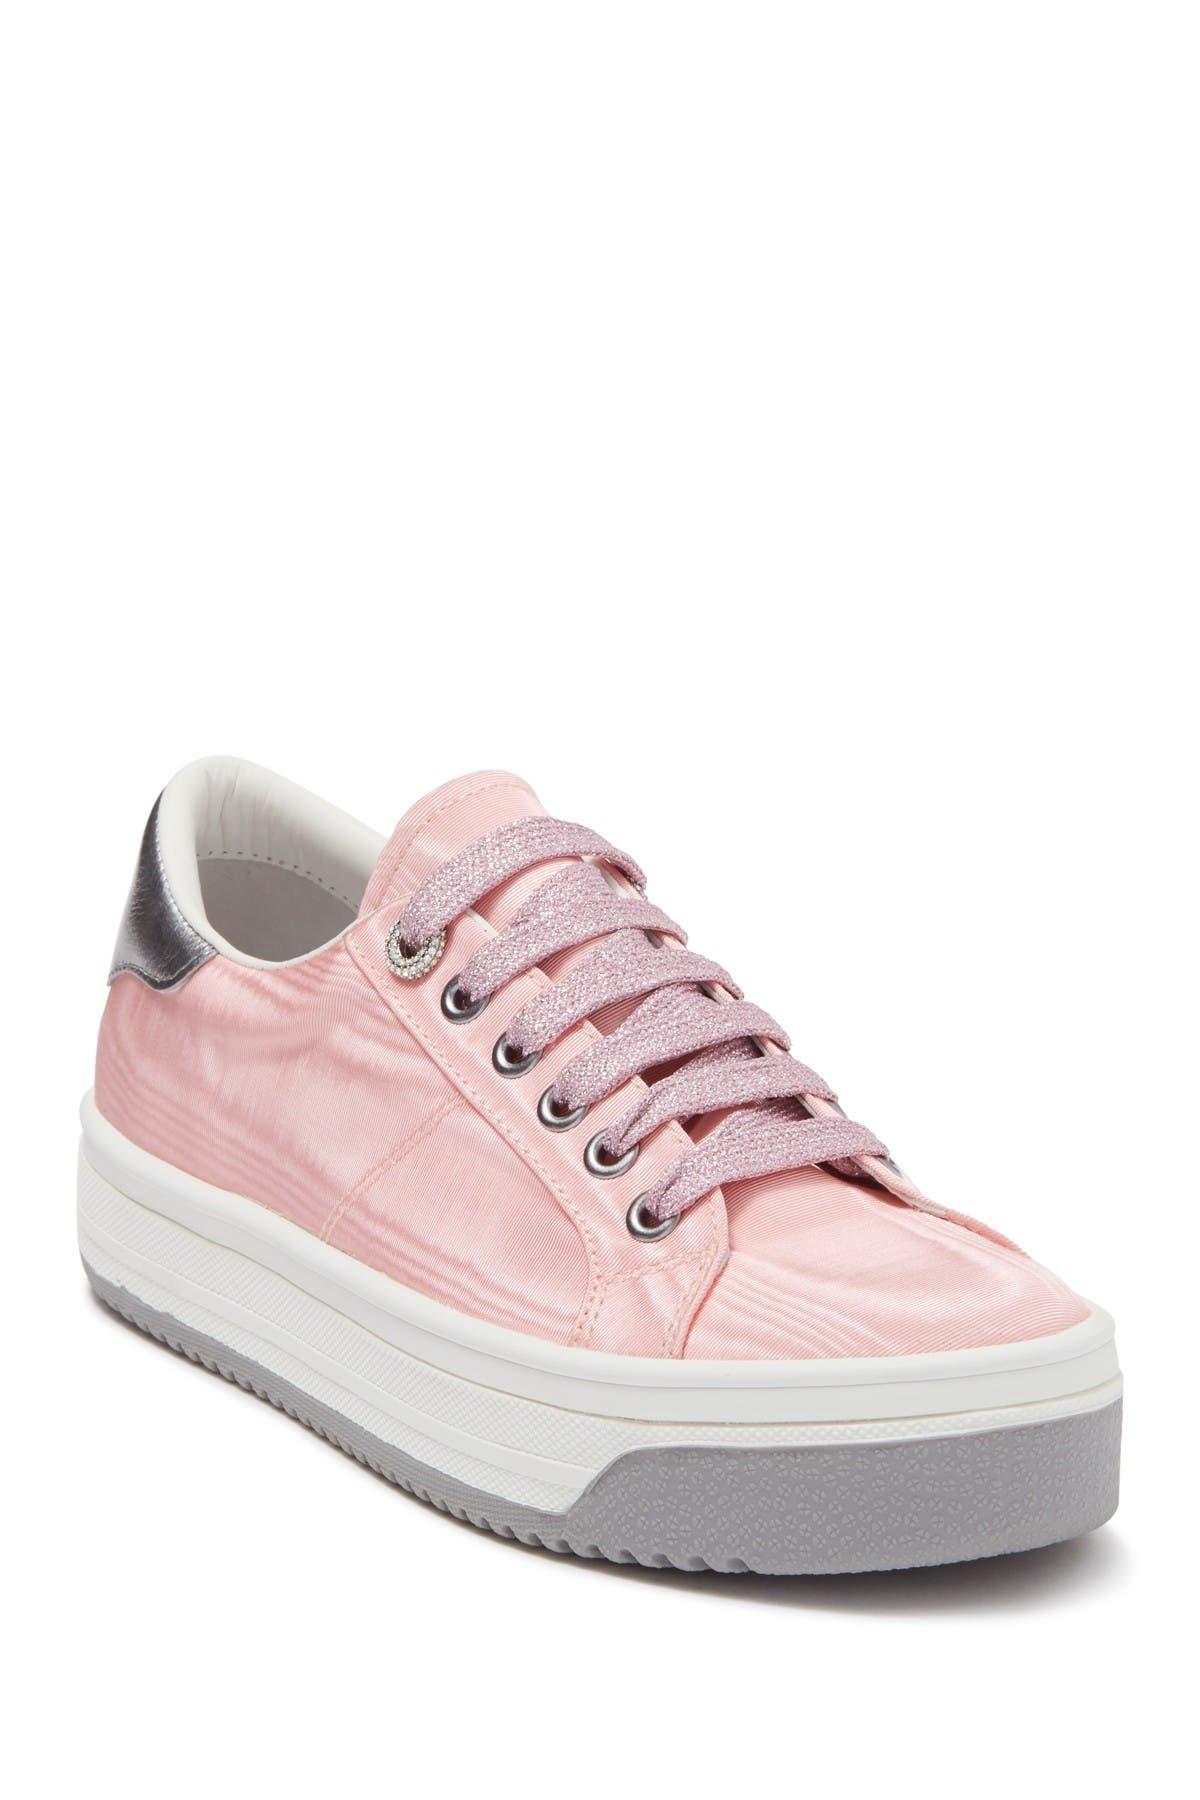 Image of Marc Jacobs Empire Platform Sneaker